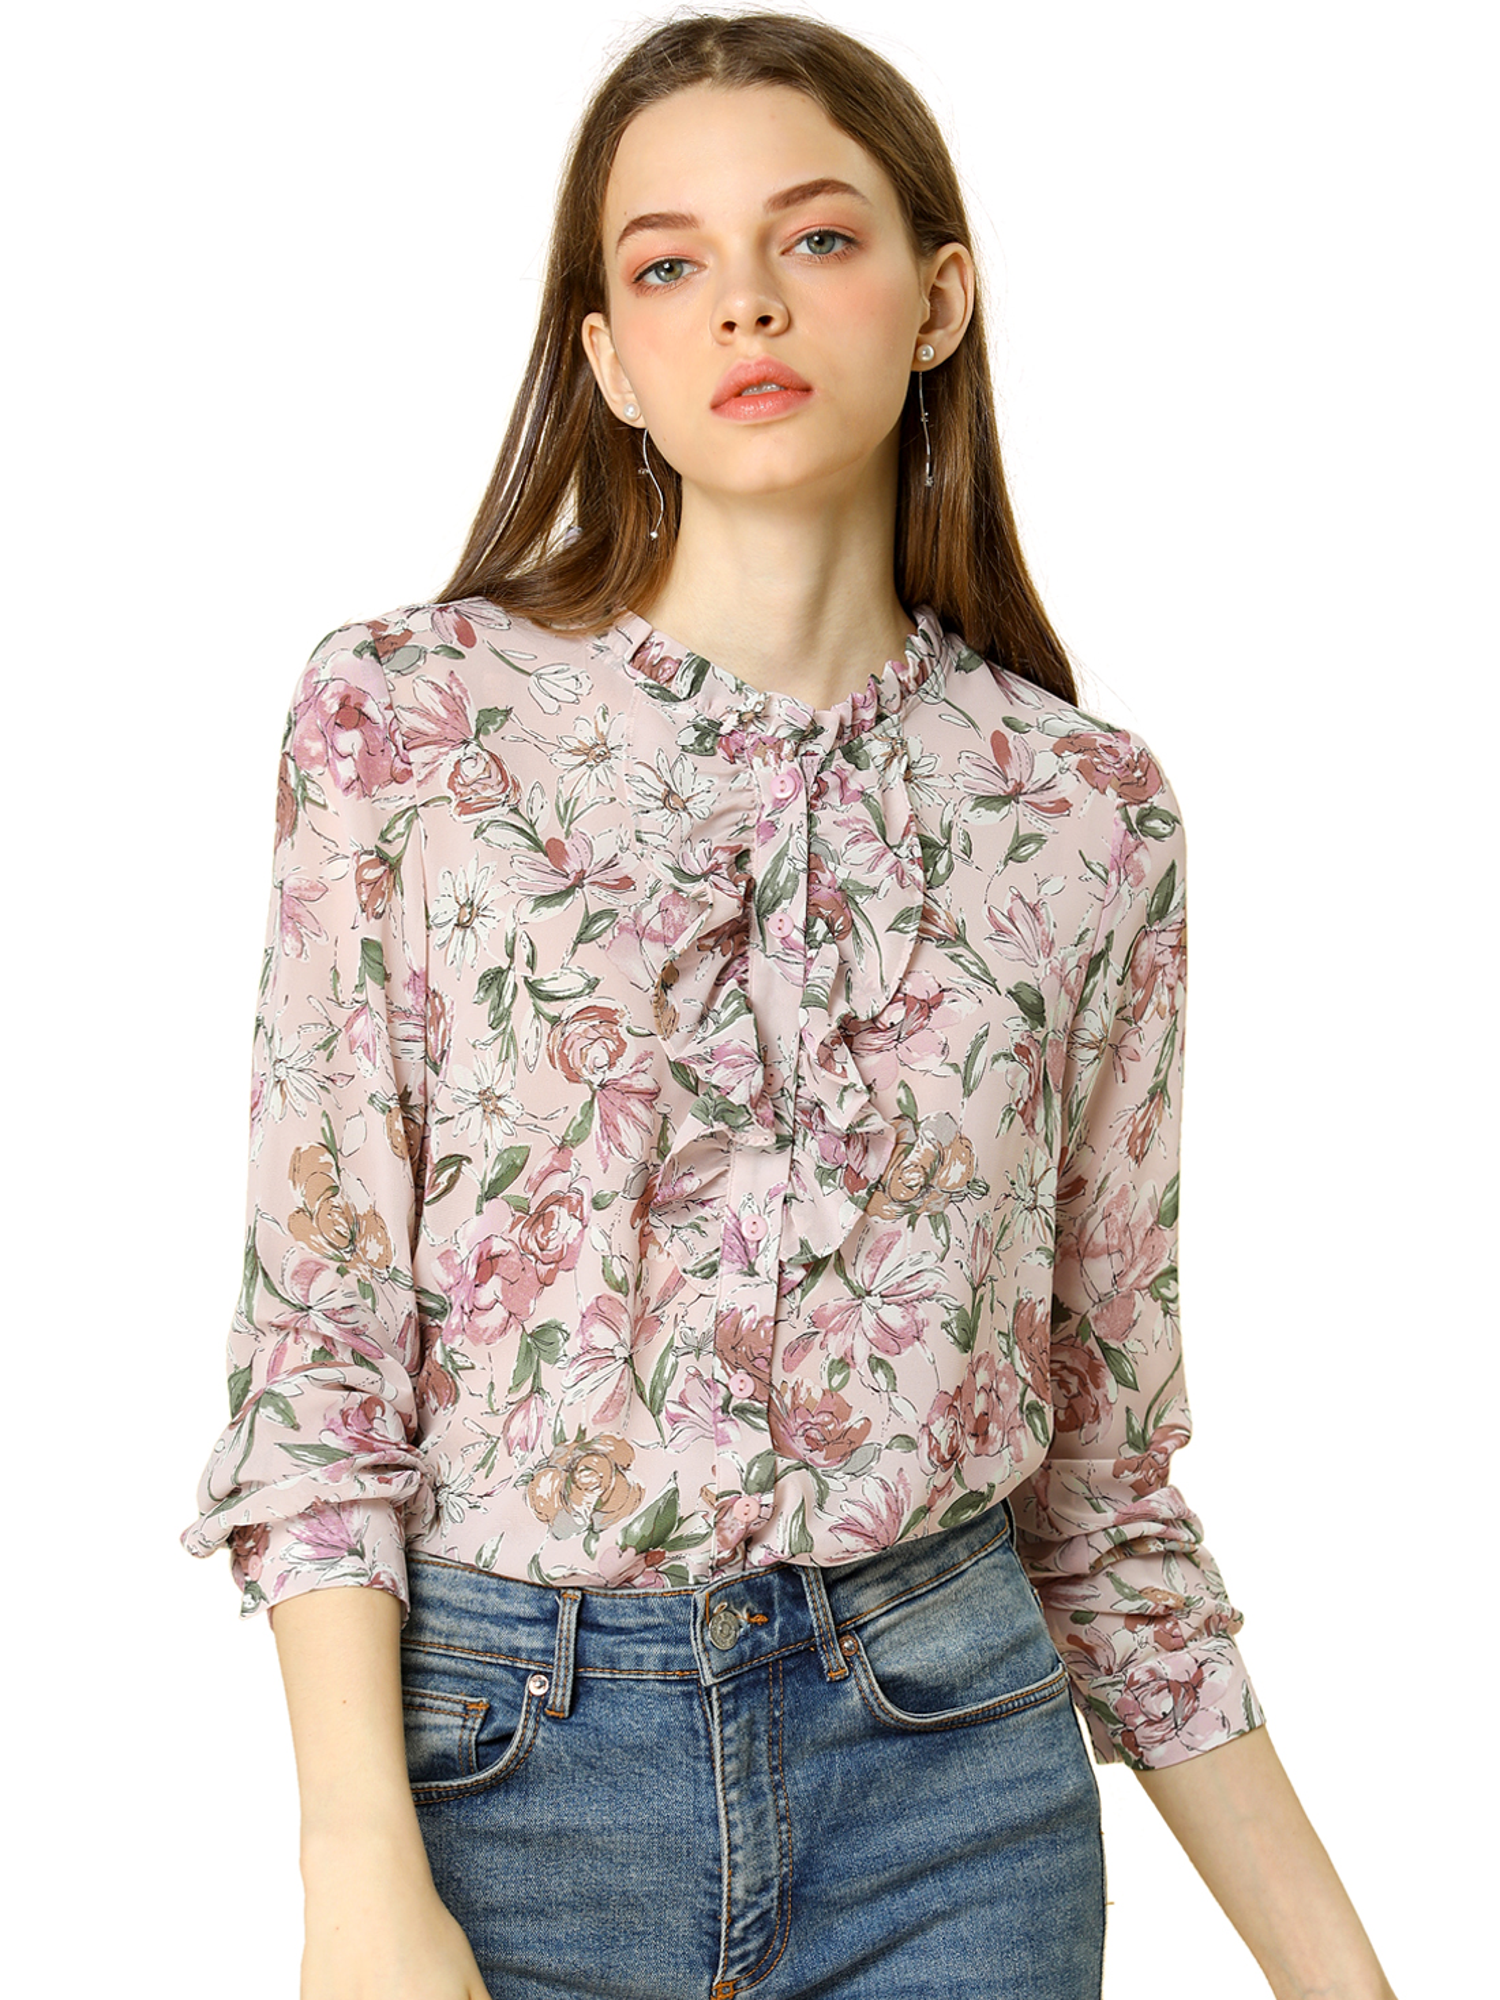 Women's Long Sleeve Ruffle Collar Button Down Floral Shirt Pink S (US 6)